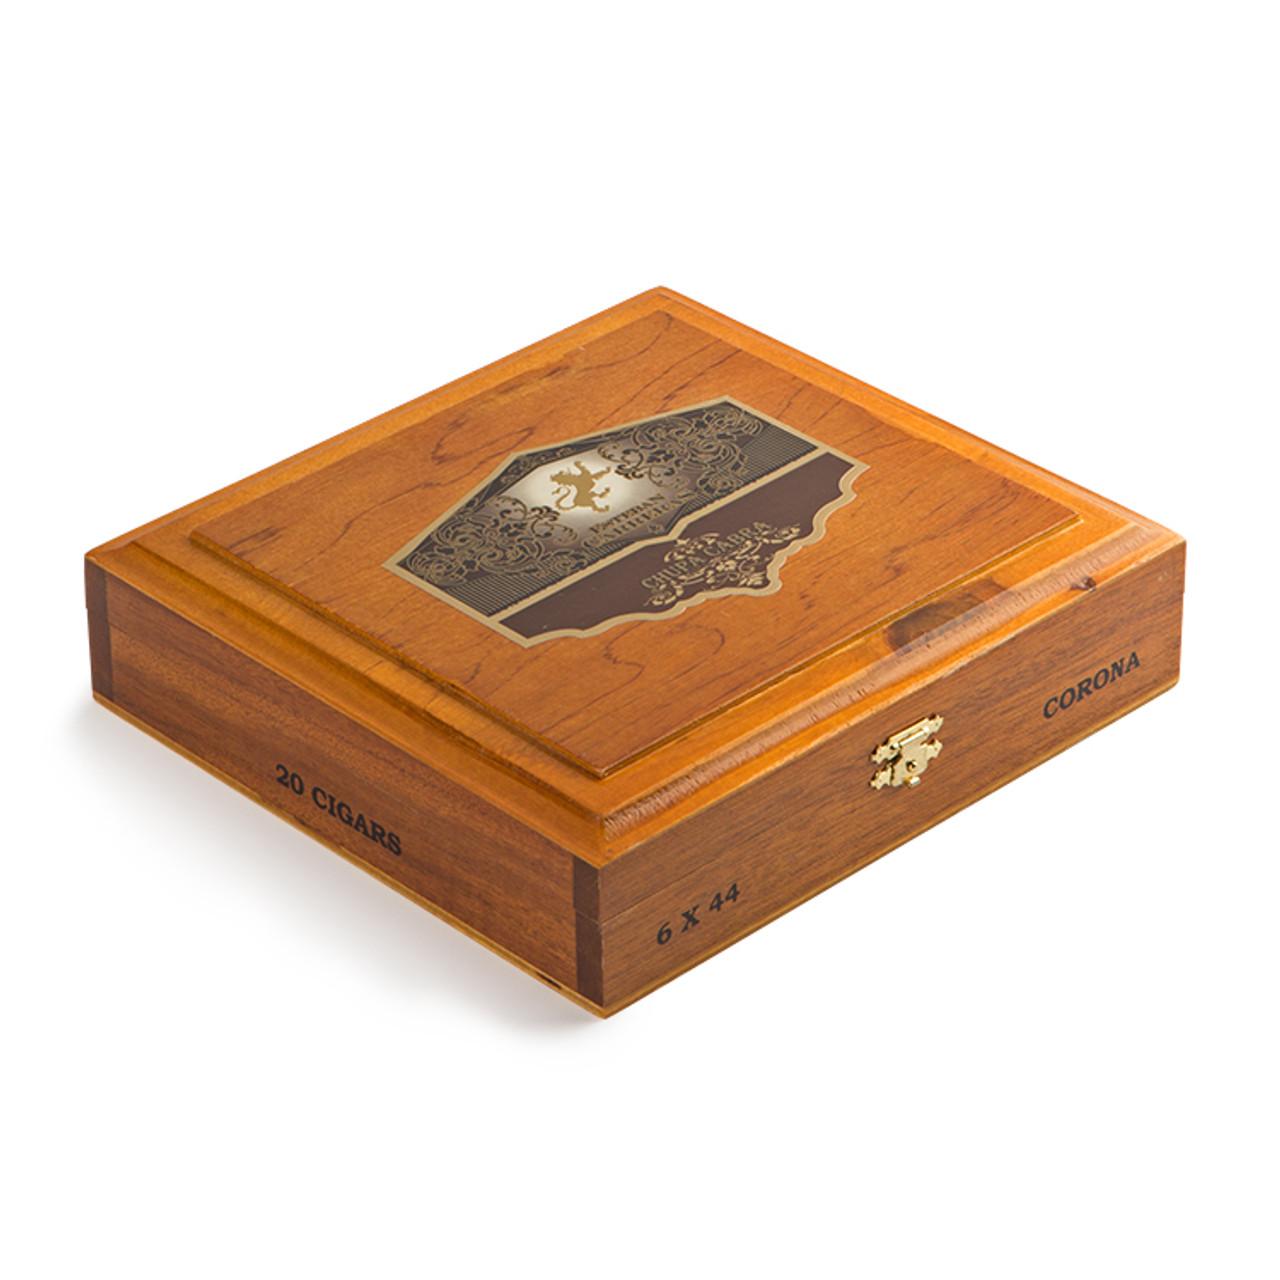 Esteban Carreras Chupacabra Corona Maduro Cigars - 6 x 44 (Box of 20)